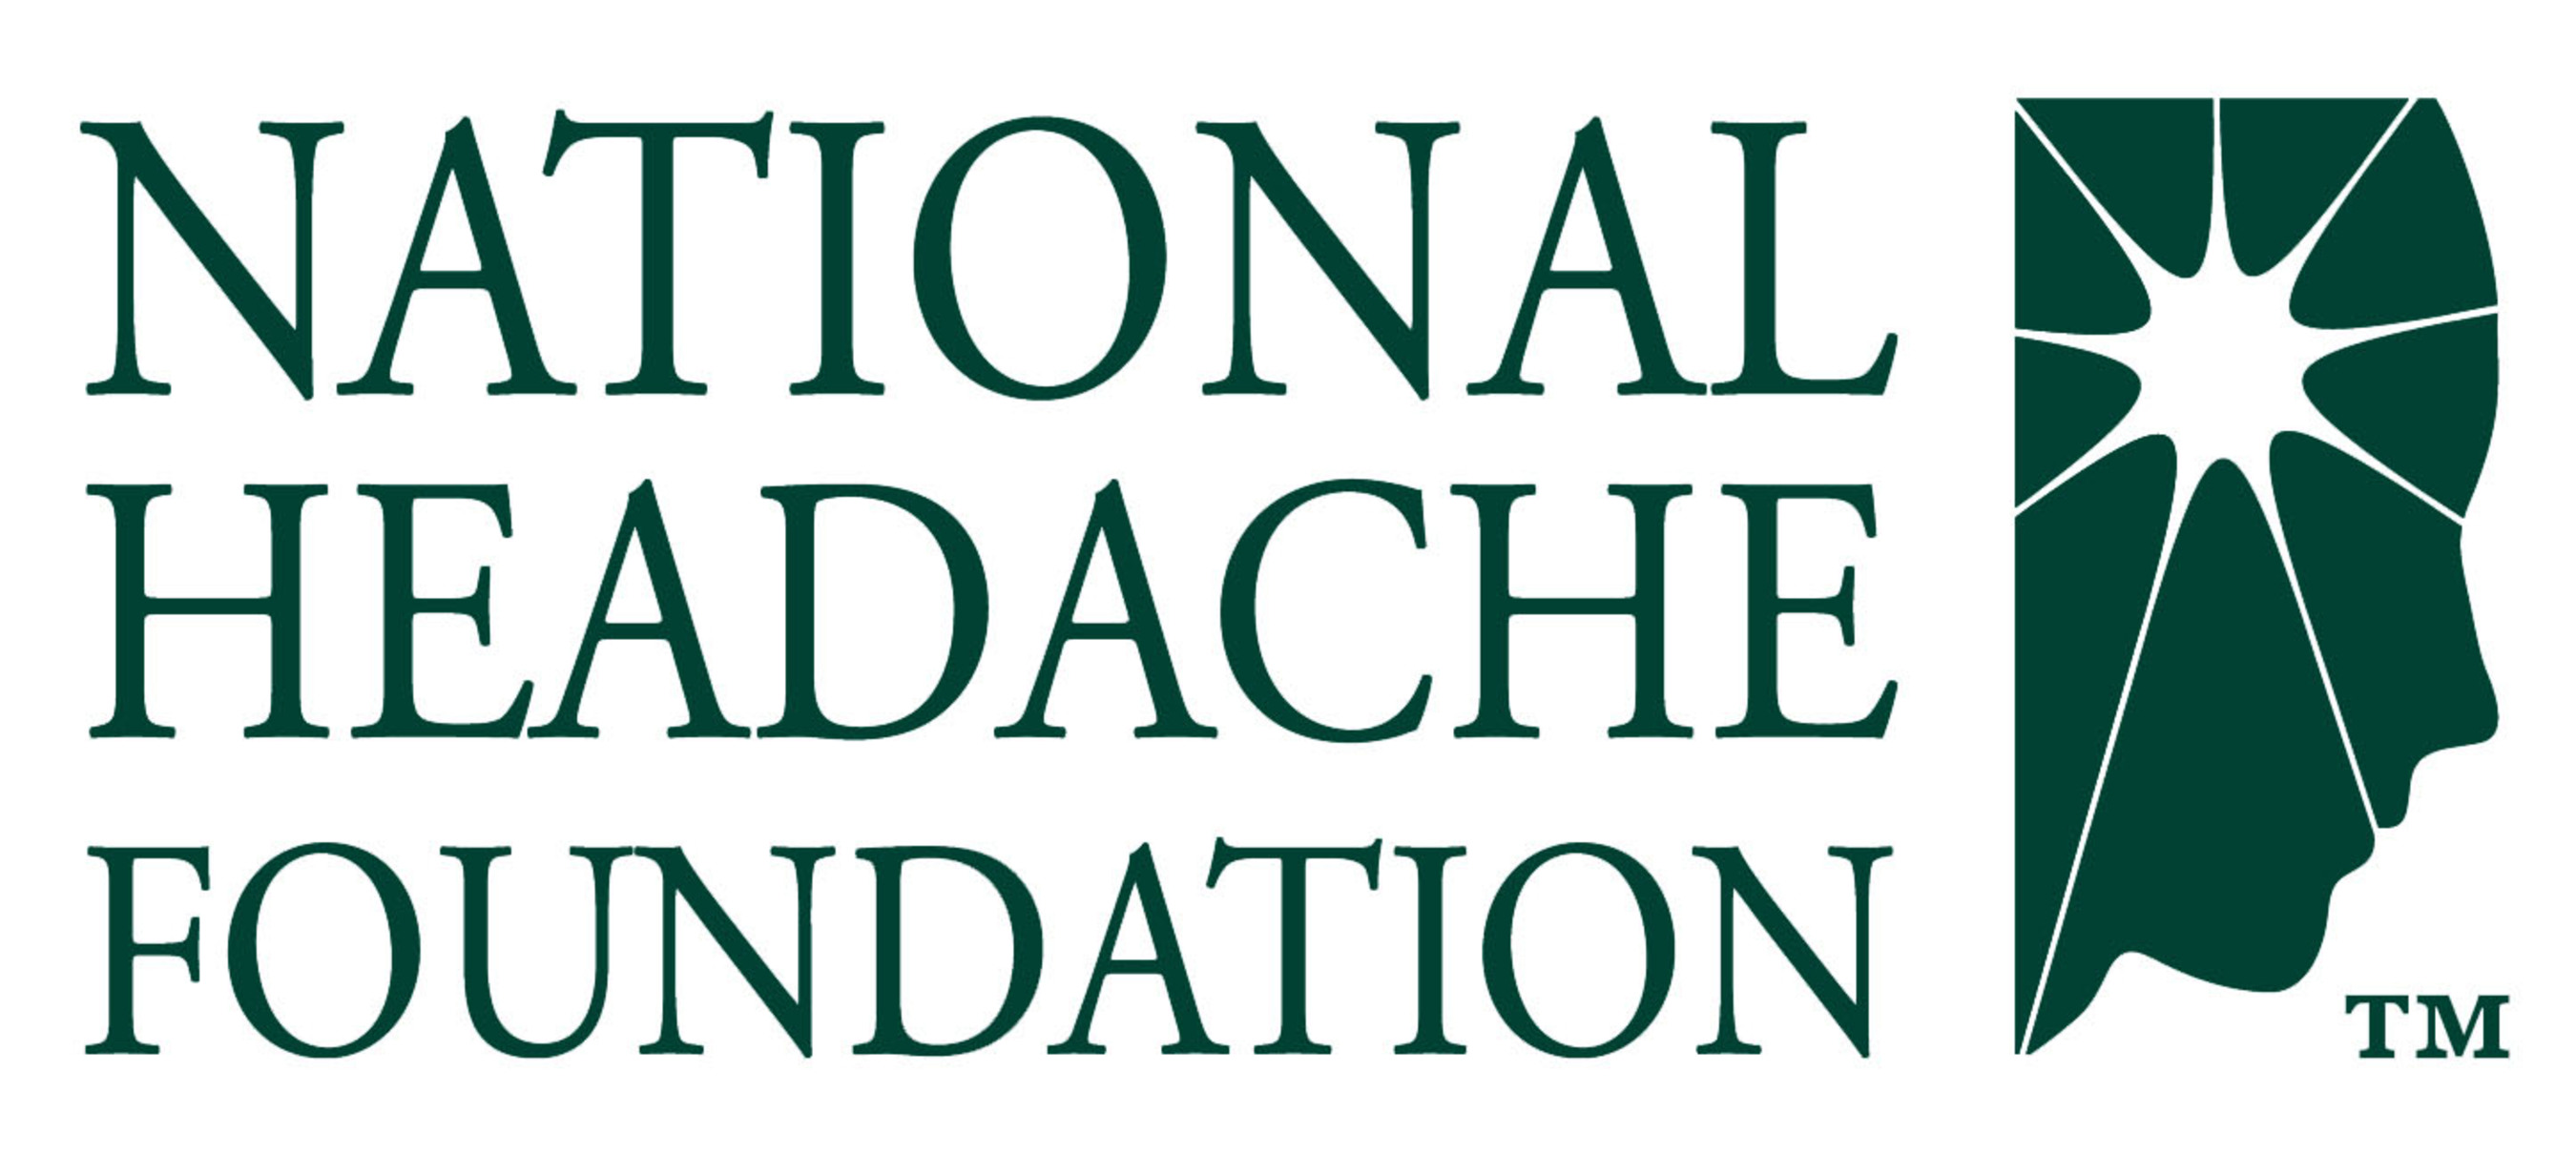 National Headache Foundation logo